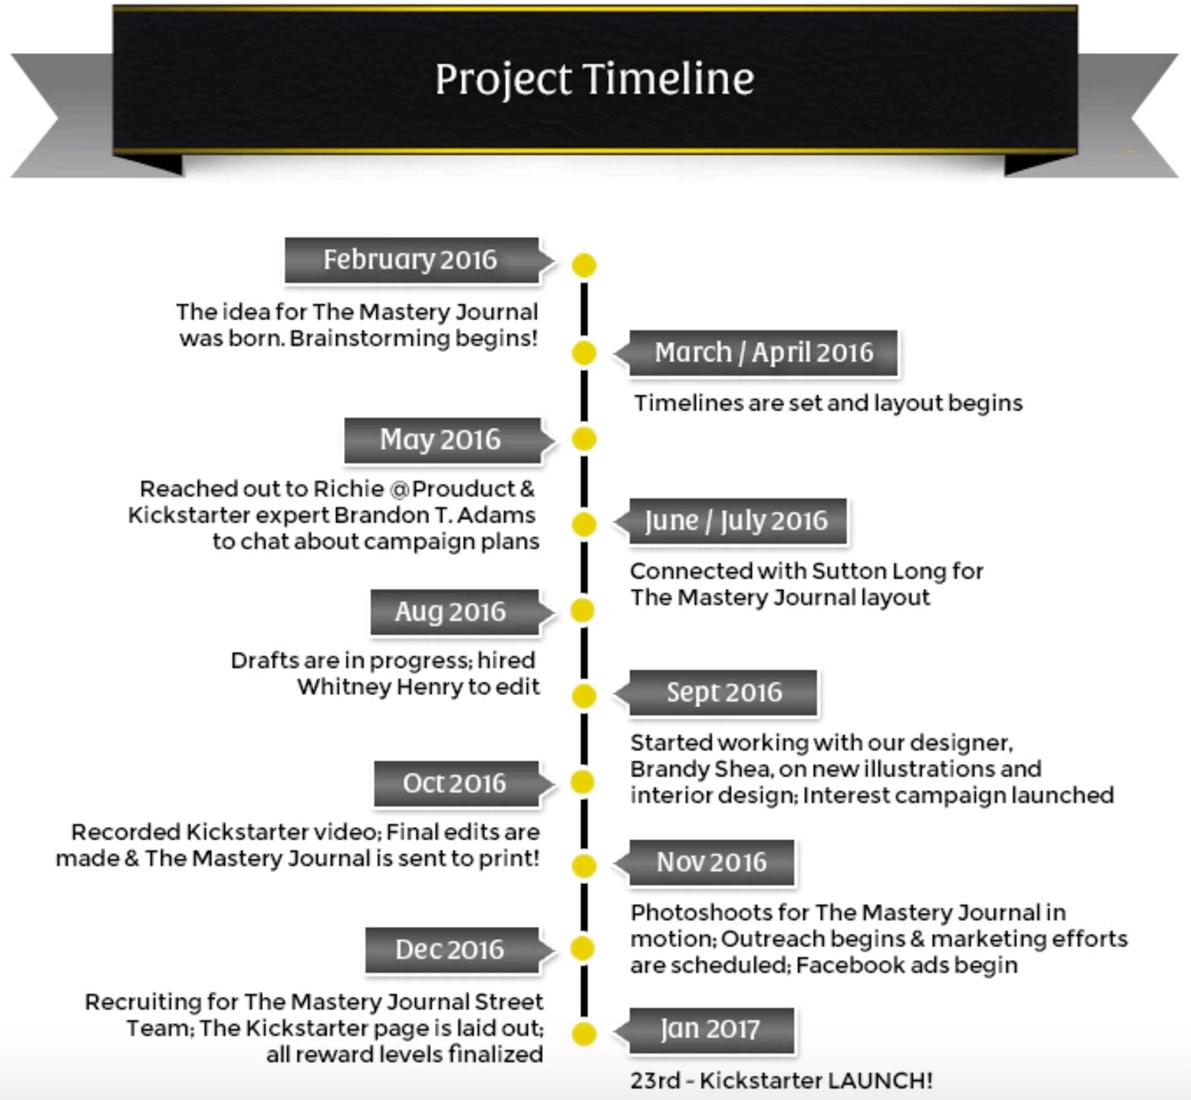 TMJ Project Timeline